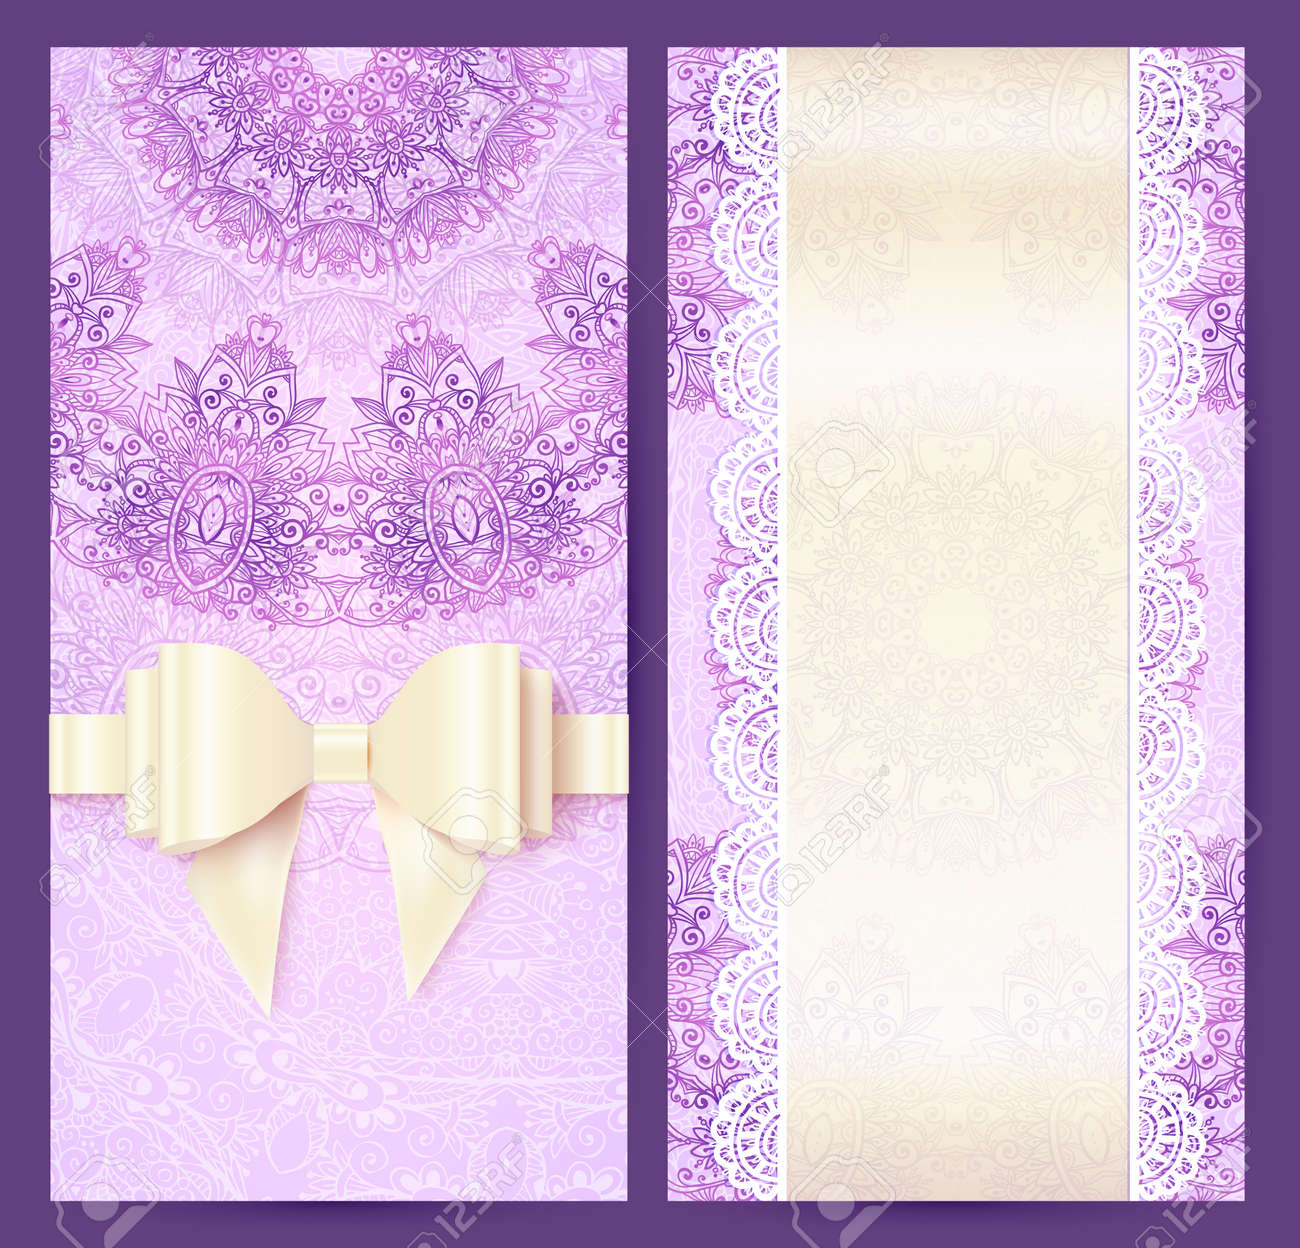 Purple Vintage Lacy Wedding Invitation Template Royalty Free ...